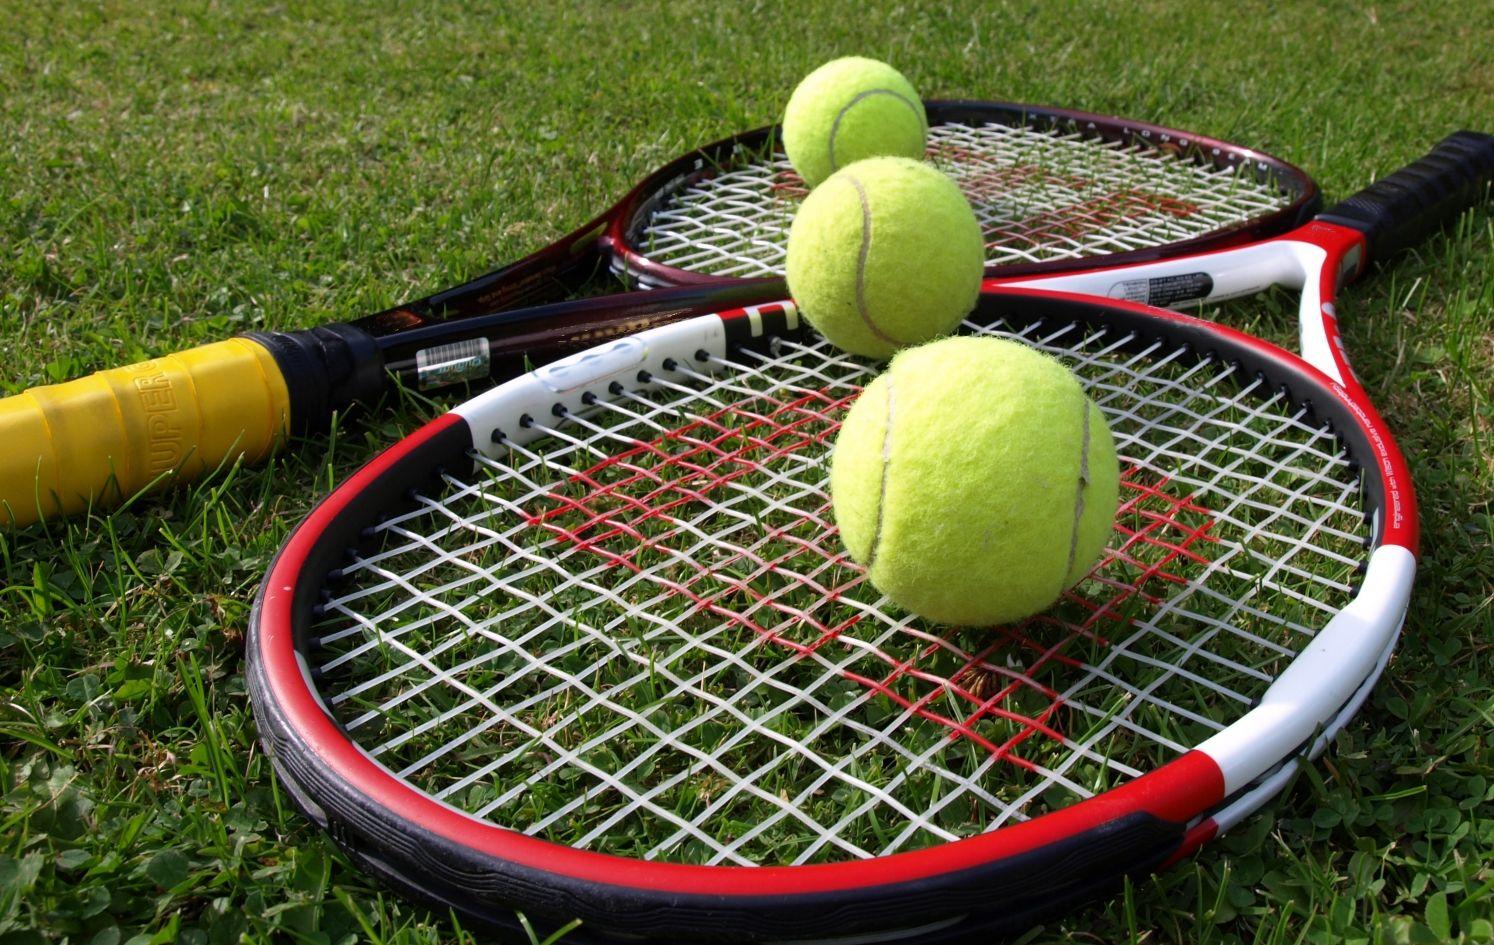 Training Pads Closet Of Free Samples Never Pay Full Price Deals Free Stuff Saving Money Tennis Tennis Workout Wimbledon Tennis